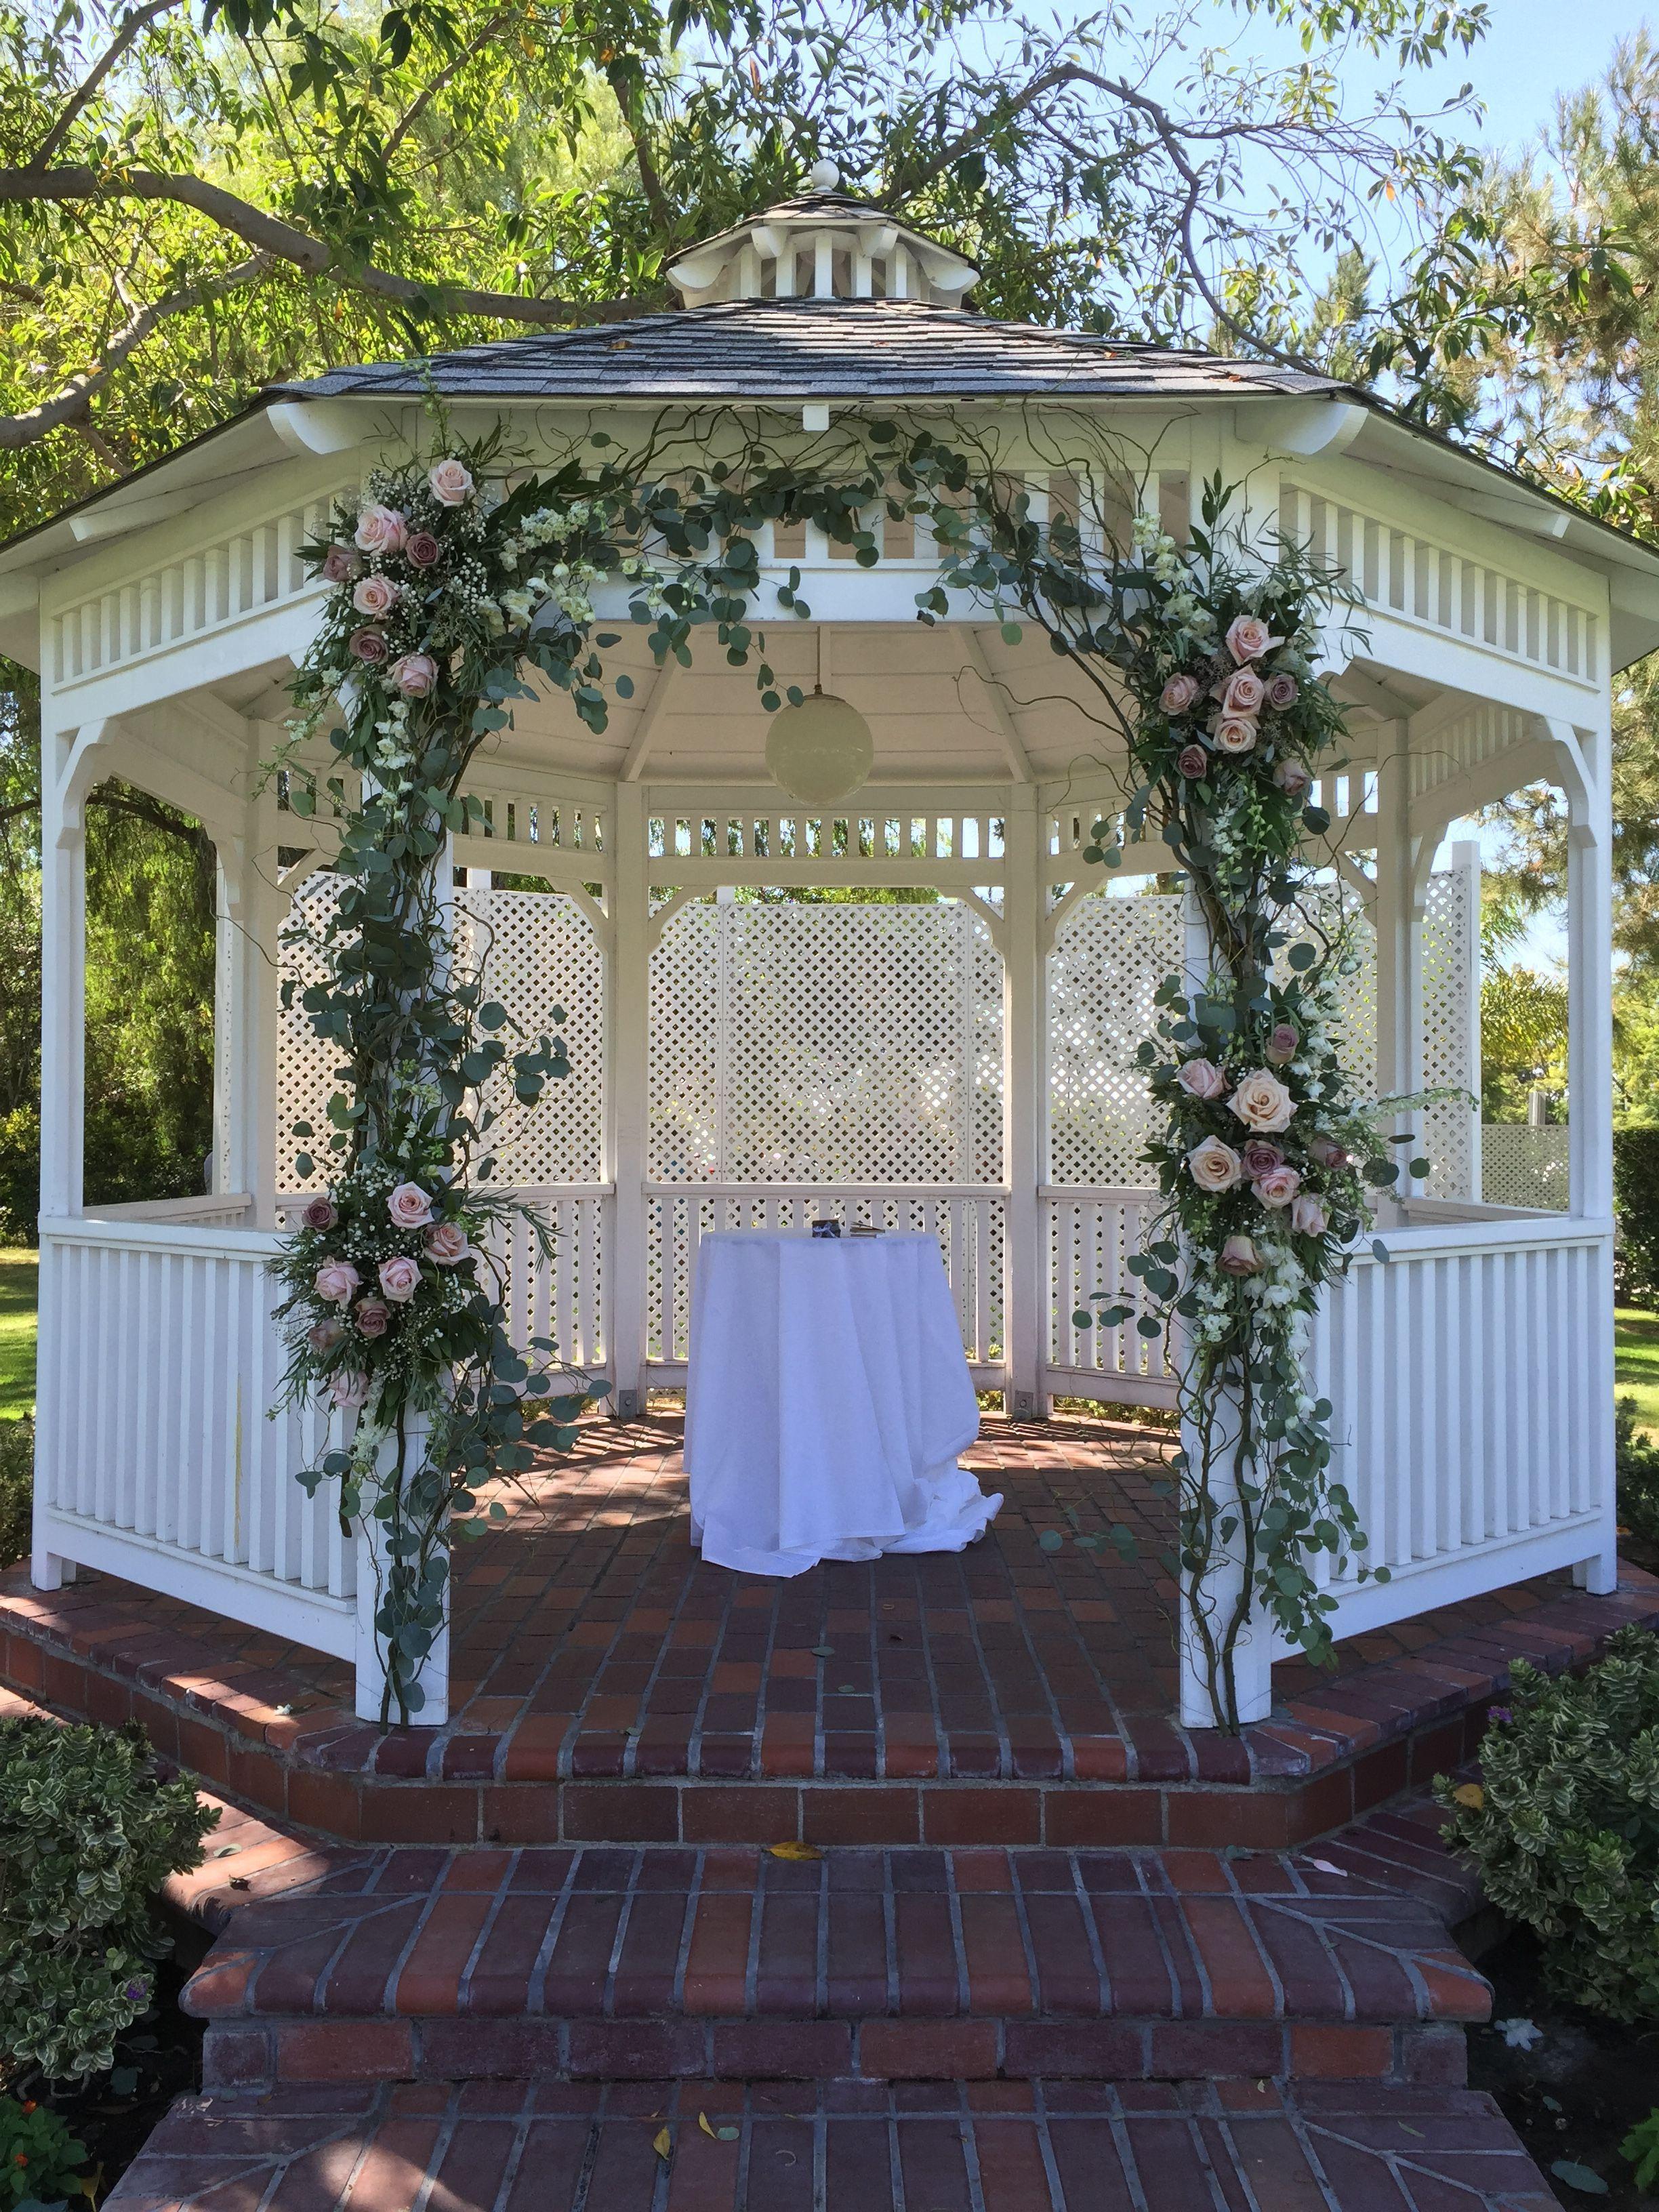 Alta vista country club wedding gazebo decor orange county weddings